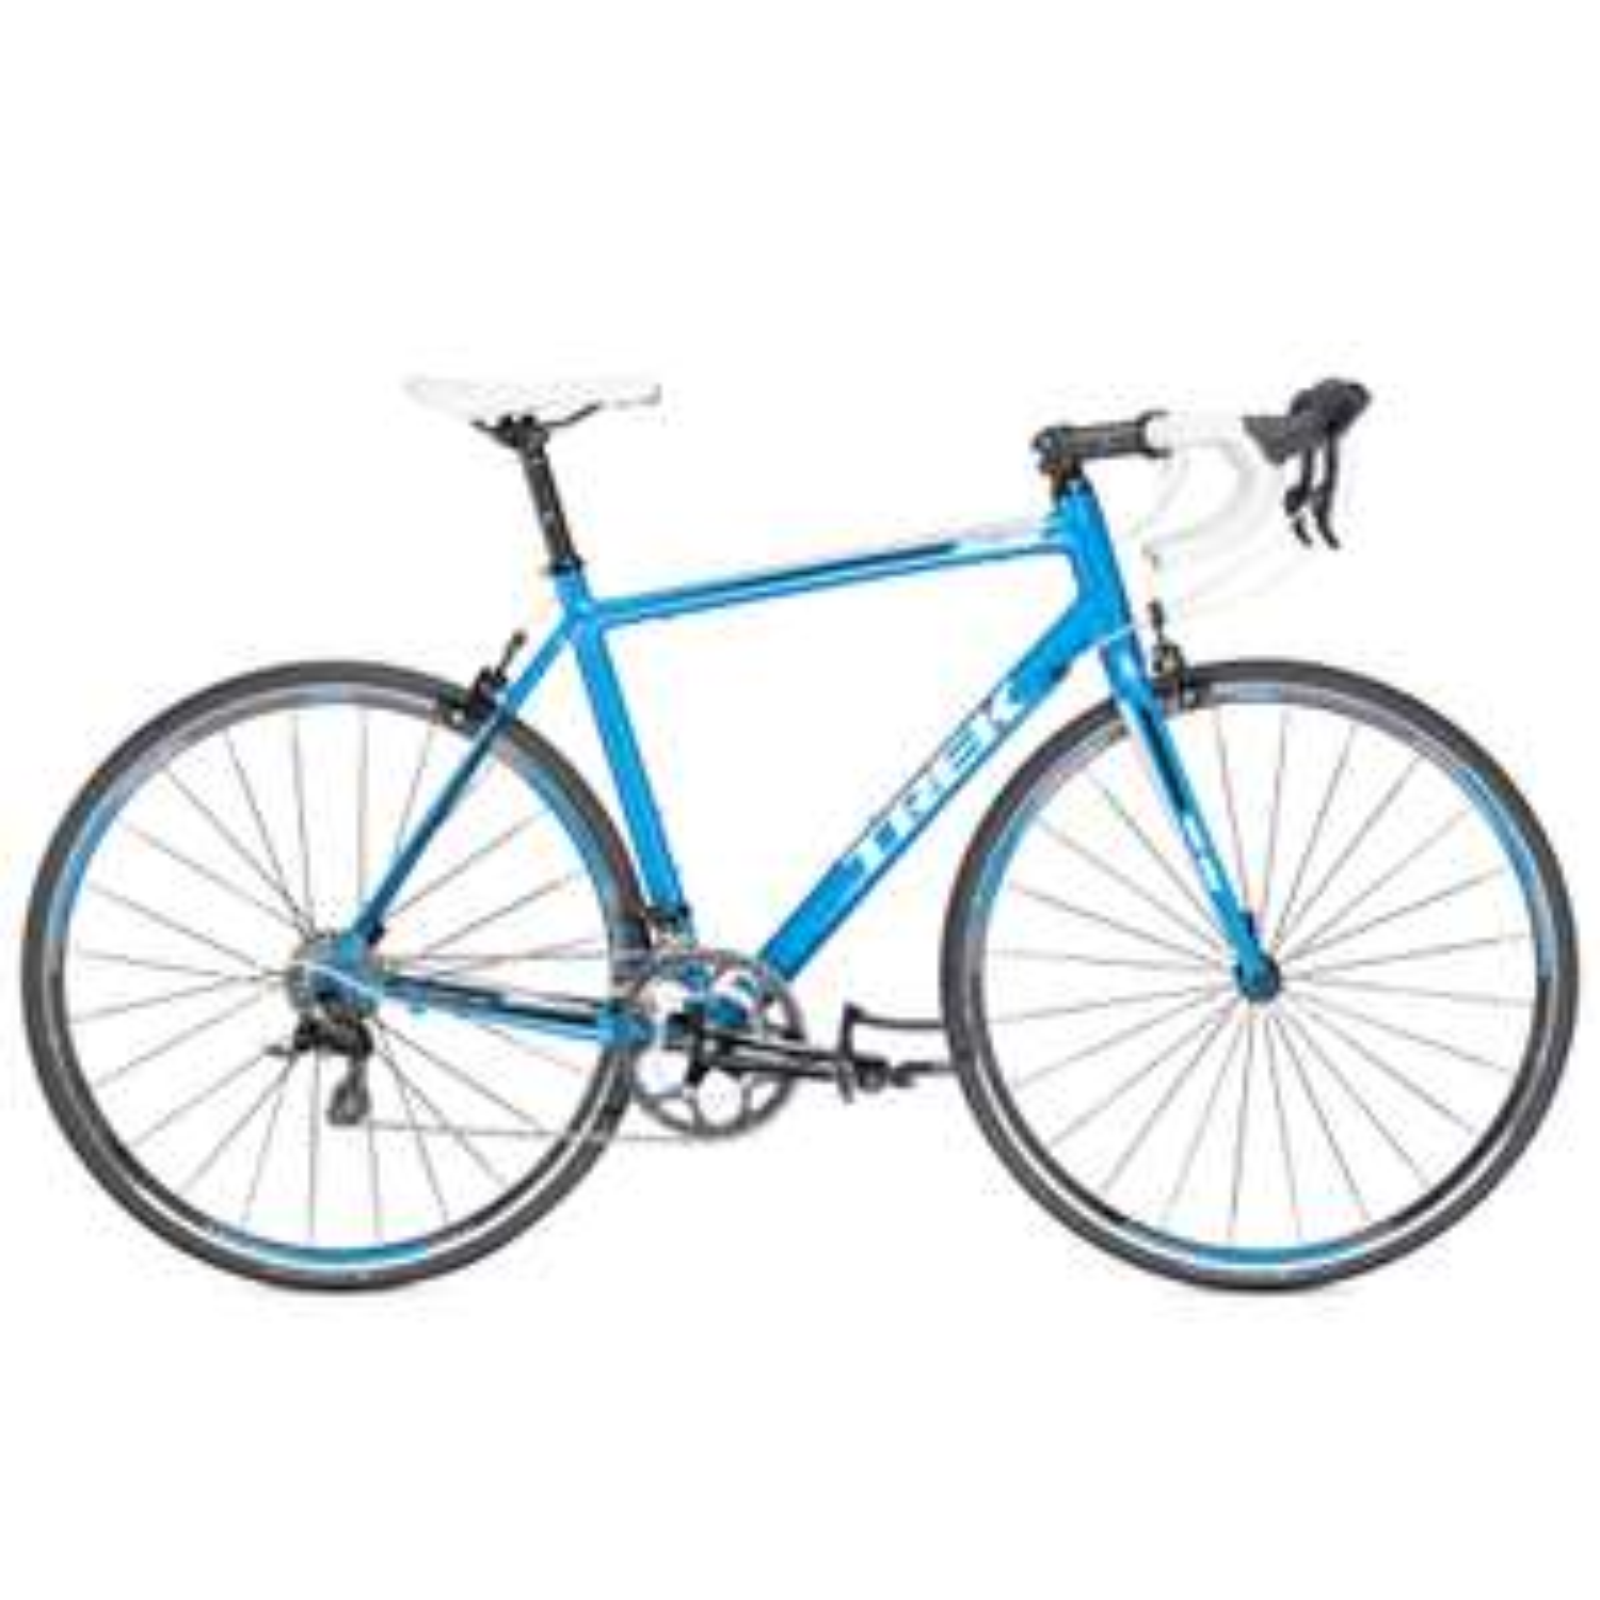 Trek 1.2 H2 Compact Road Bike (2015) - £350 @ Je James Cycles